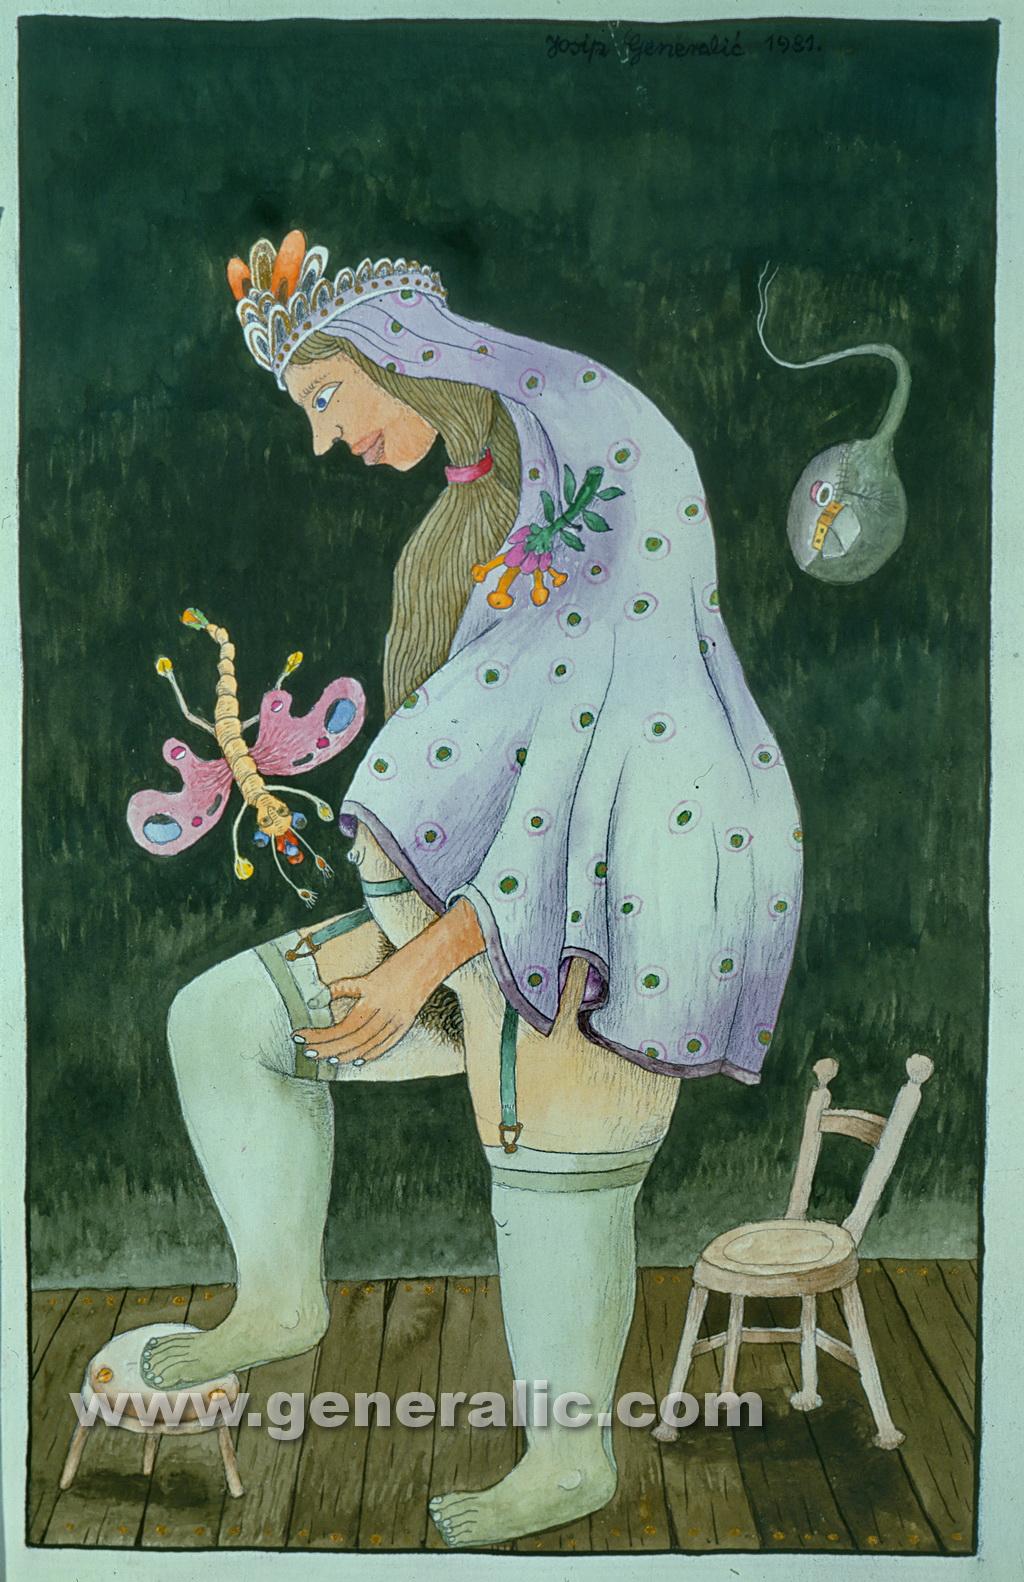 Josip Generalic, 1983, A bride, watercolour